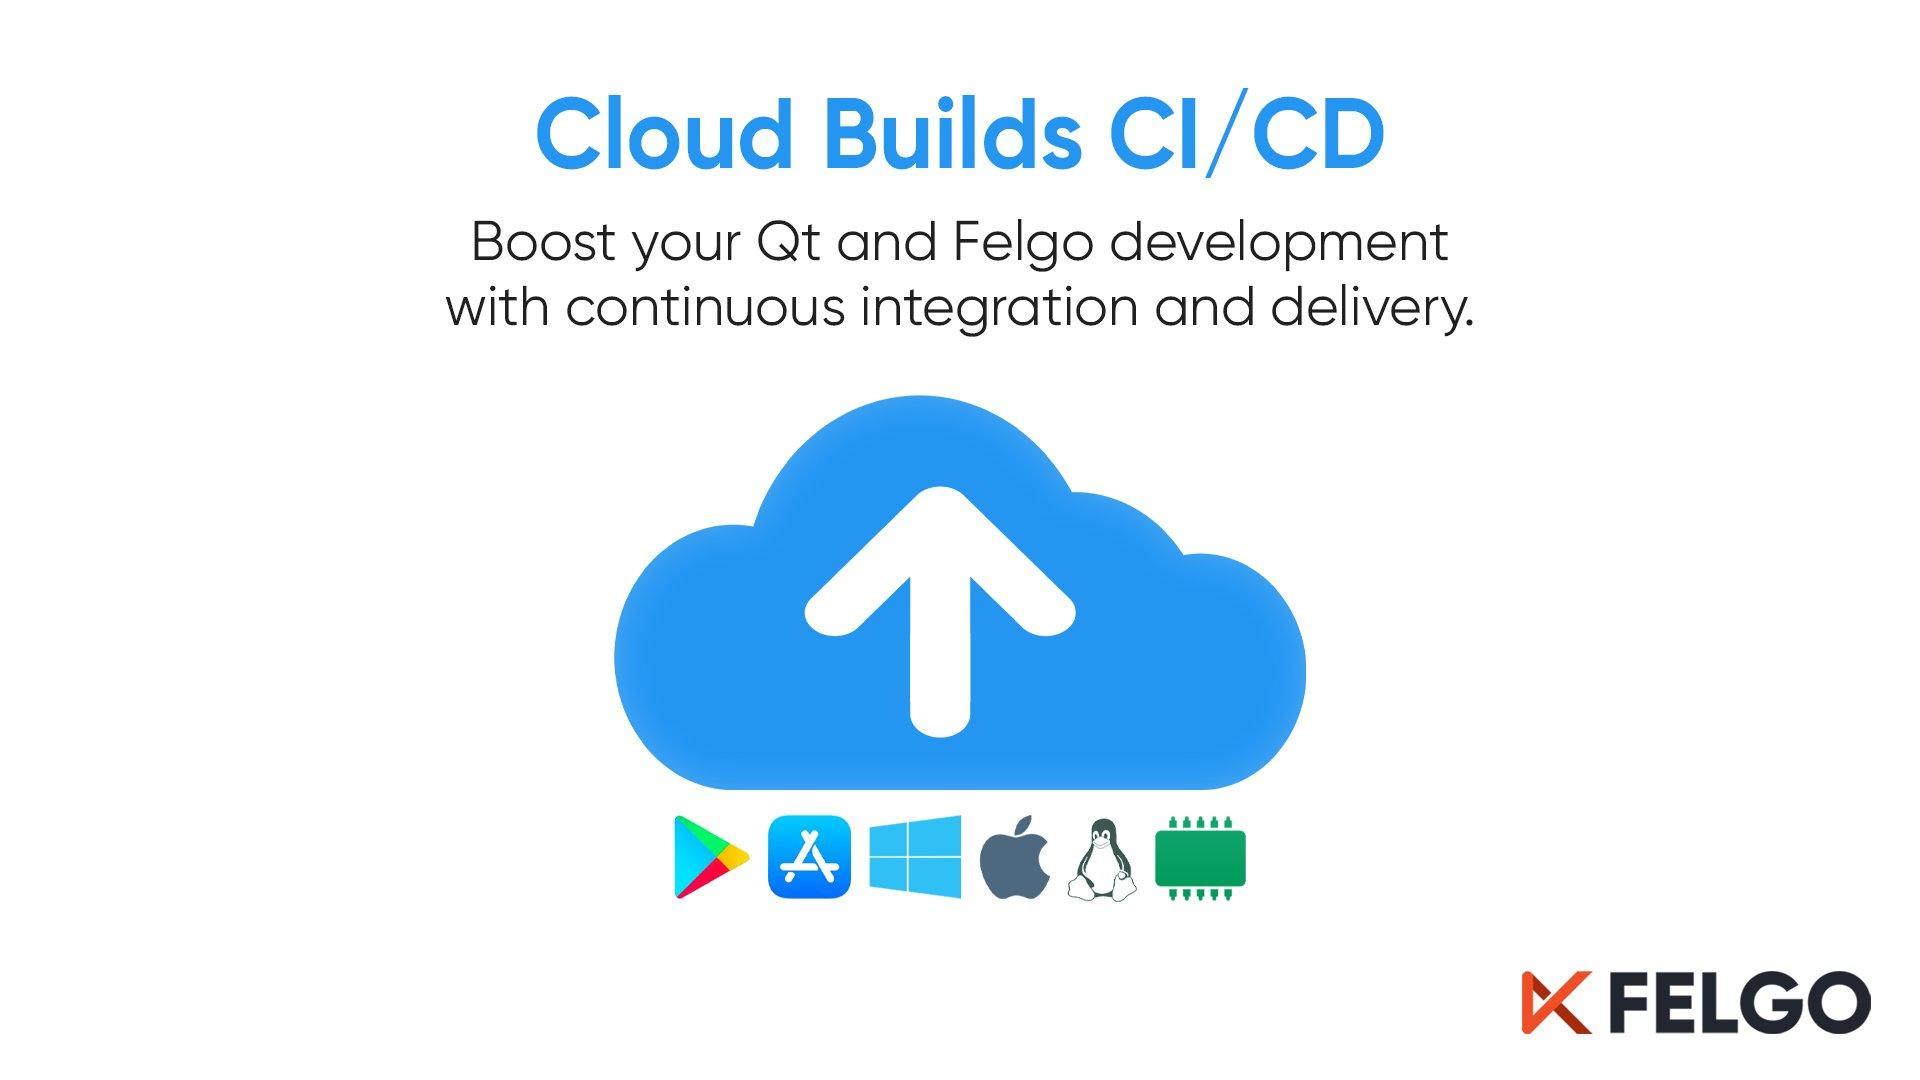 CloudBuildsGraphic - Felgo Cloud IDE